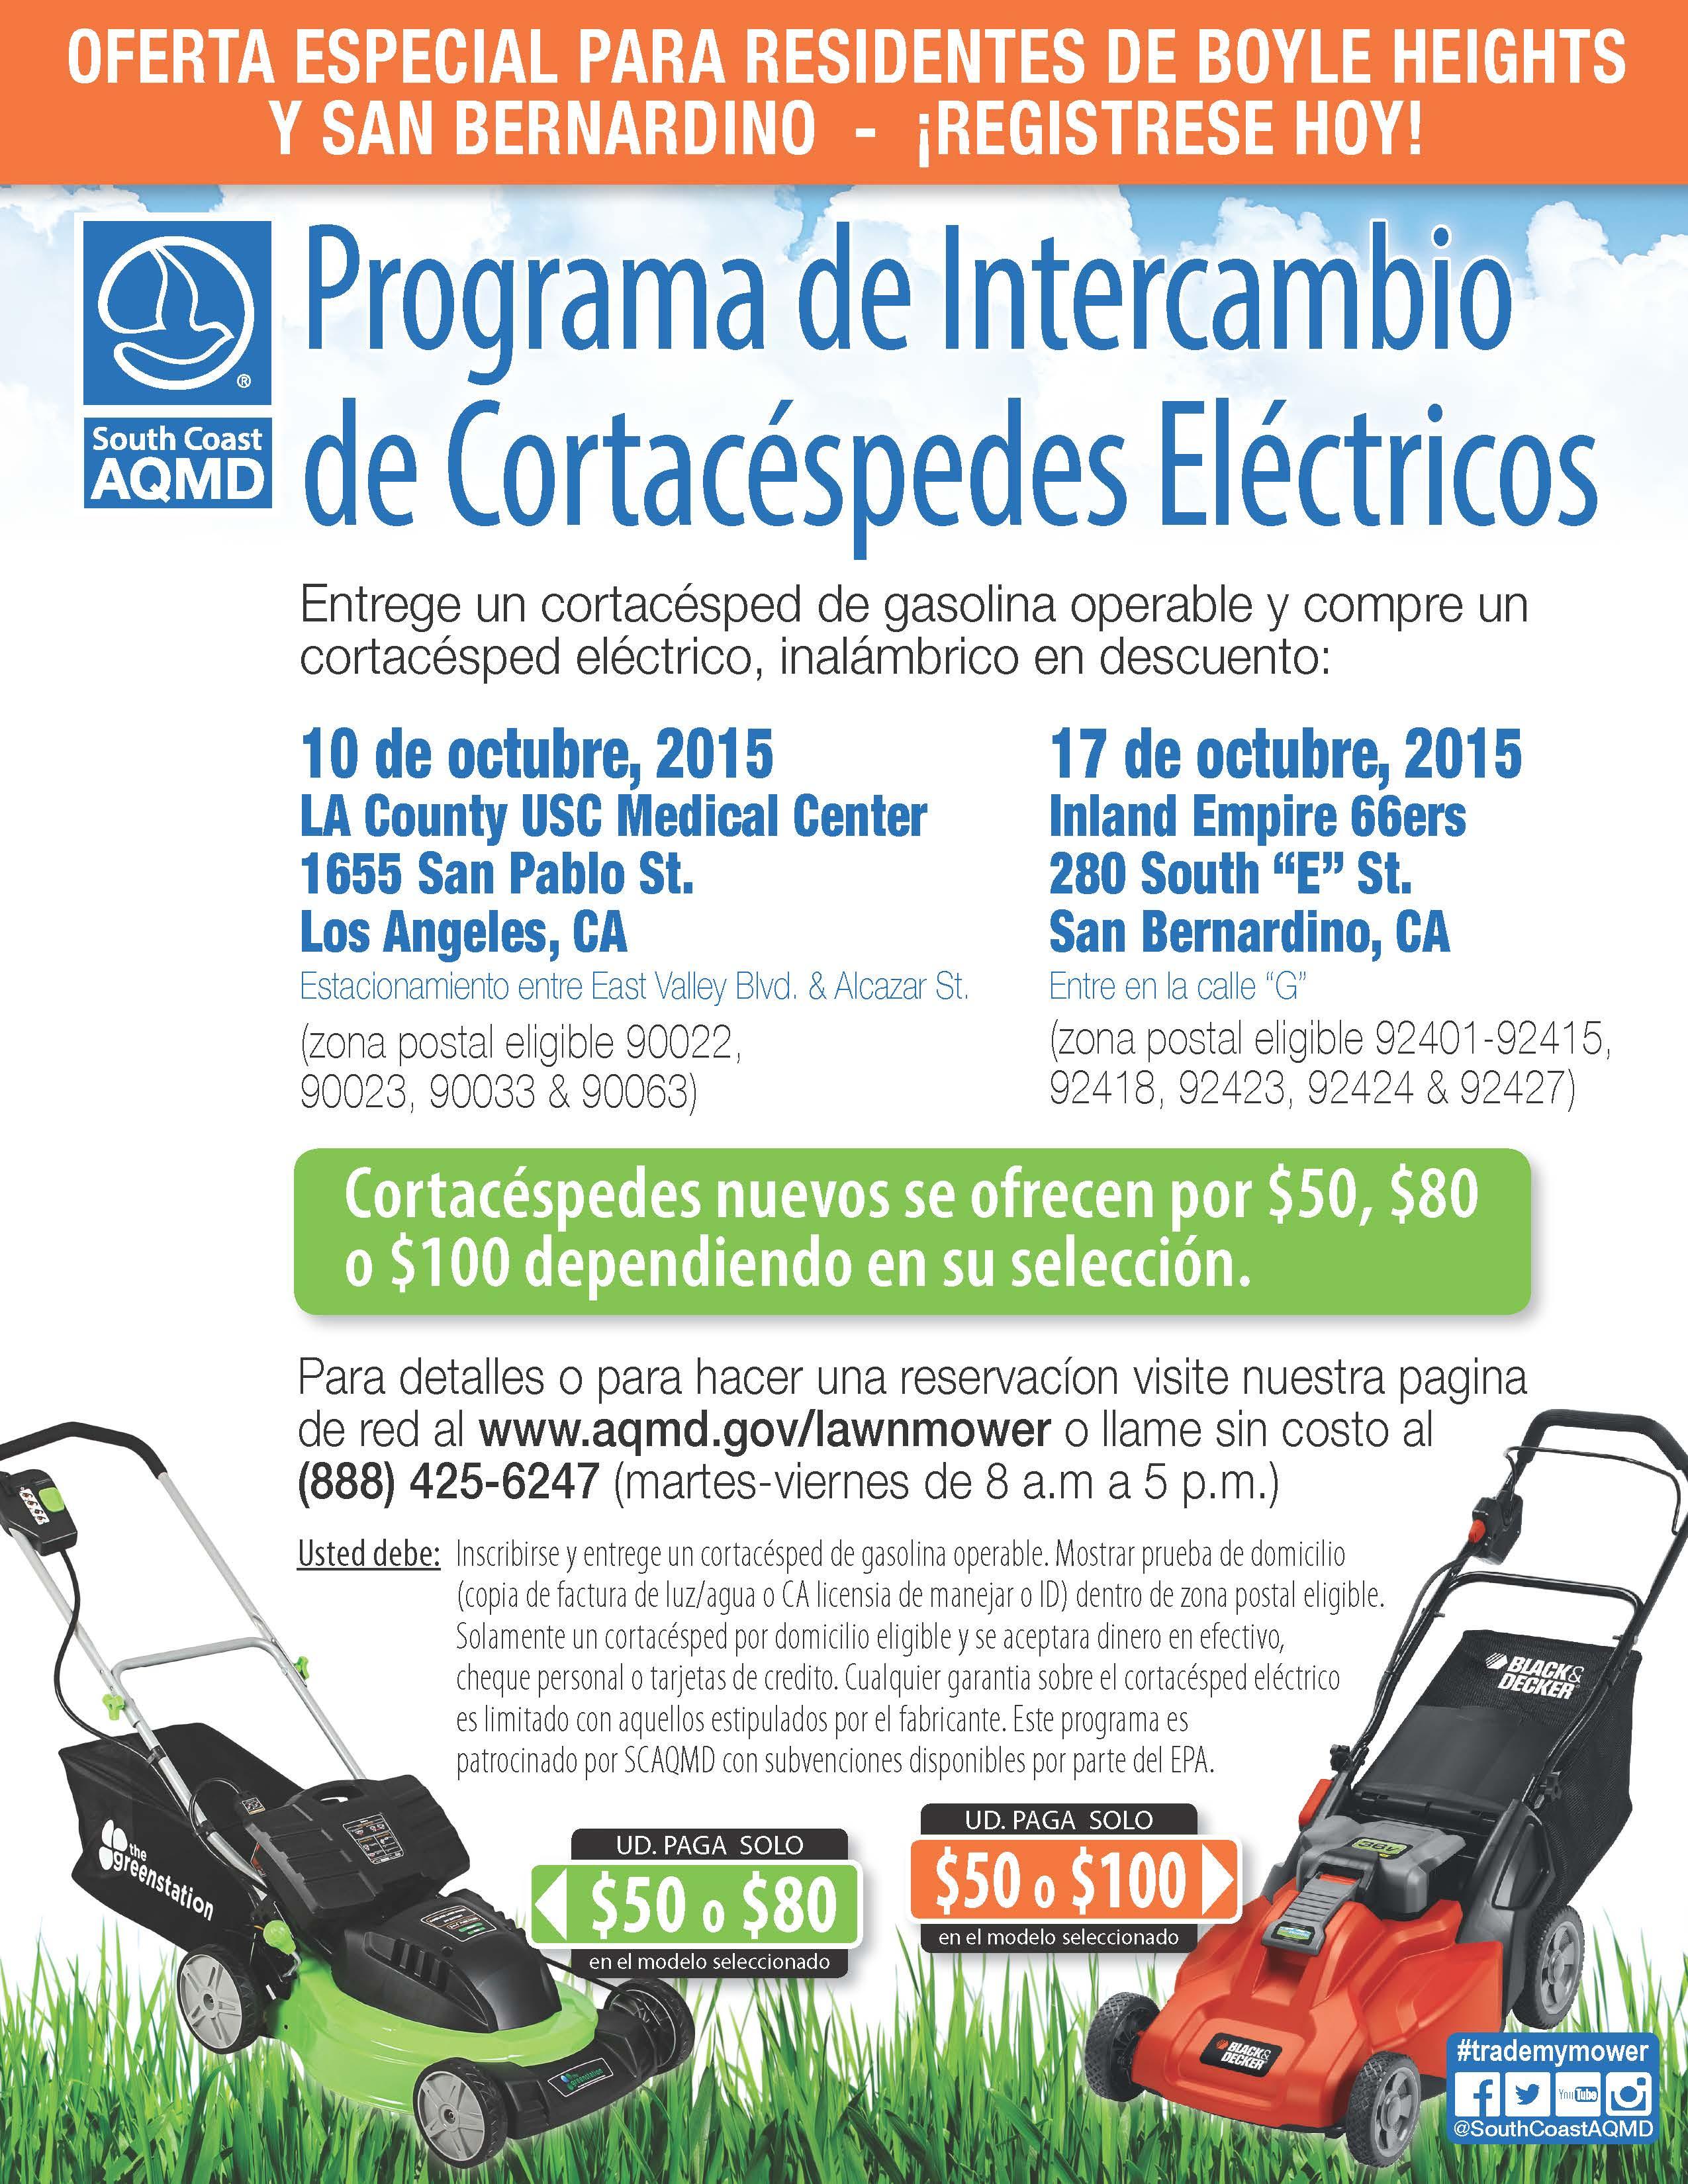 programa de intercambio de cortac eacute spedes el eacute ctricos supervisor lawn mower exchange flyer oct 15 spanish